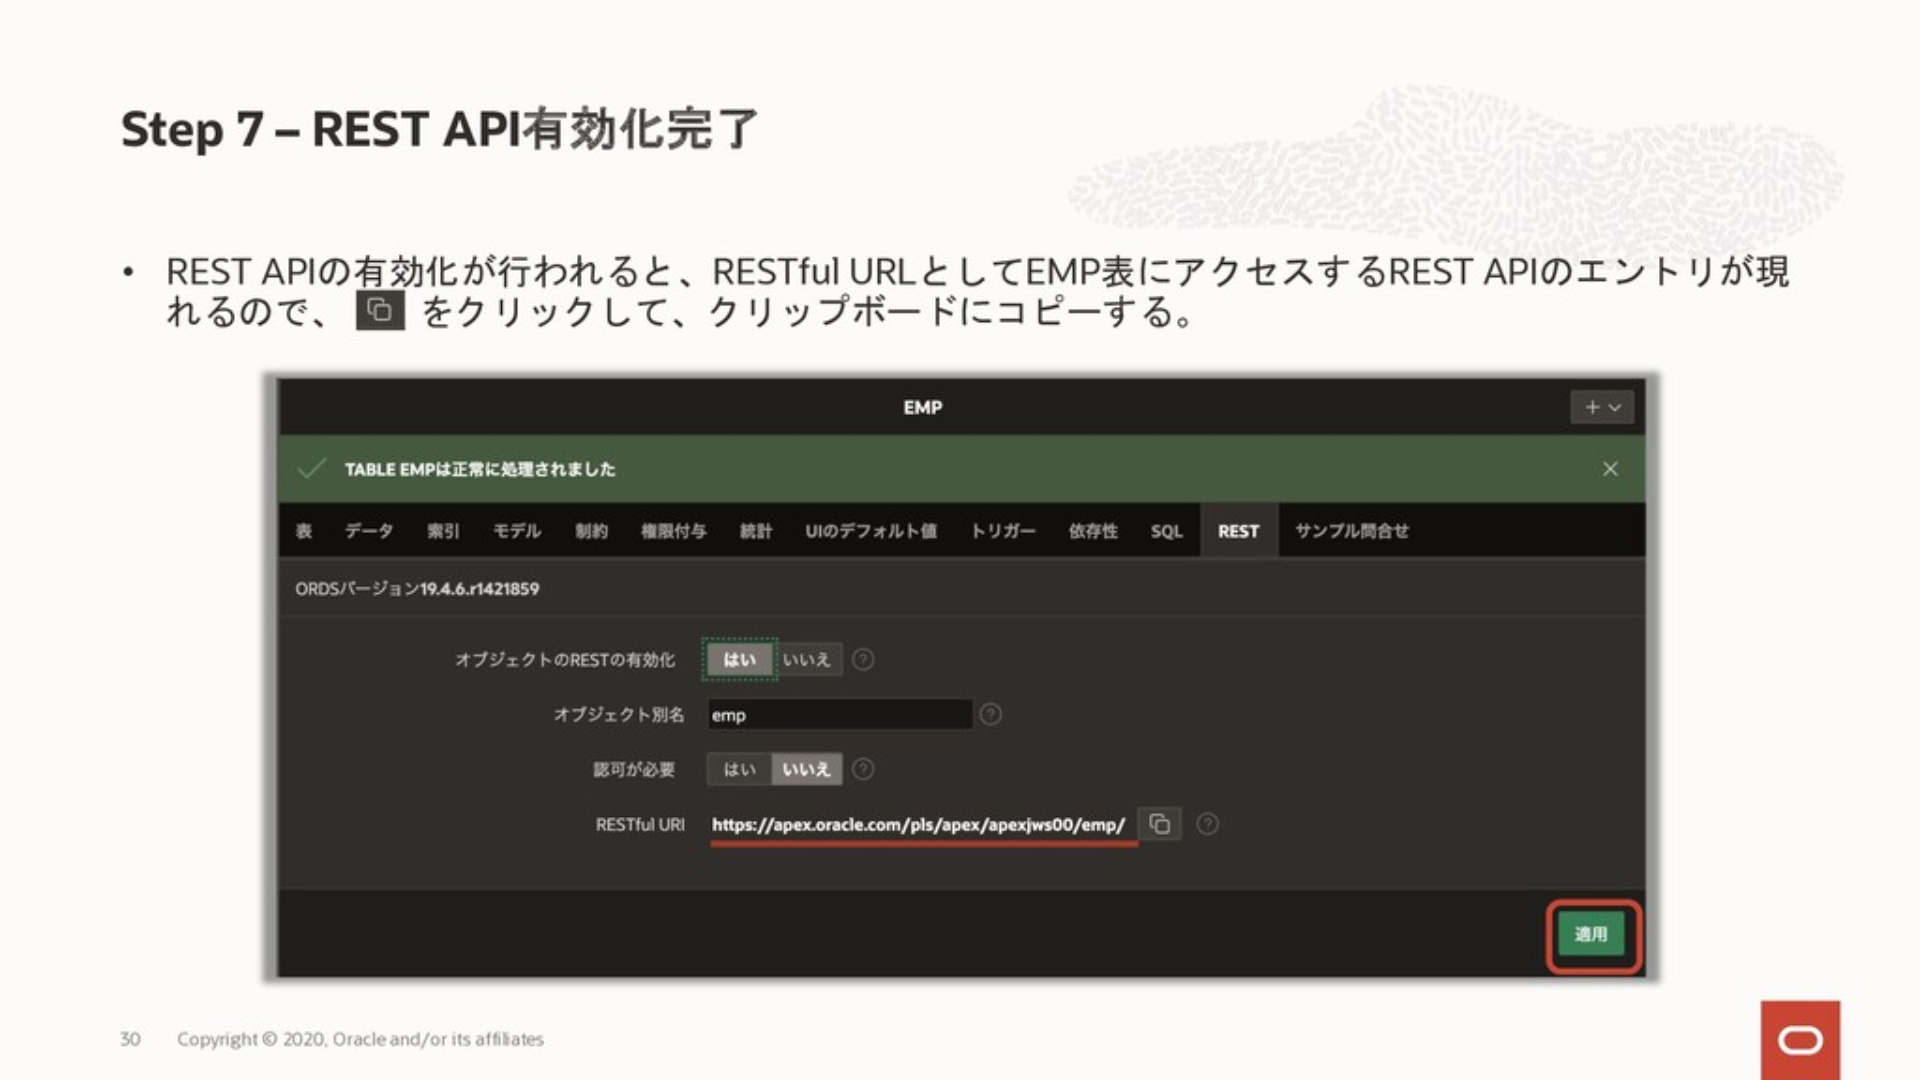 • REST APIの有効化が行われると、RESTful URLとしてEMP表にアクセスするR...